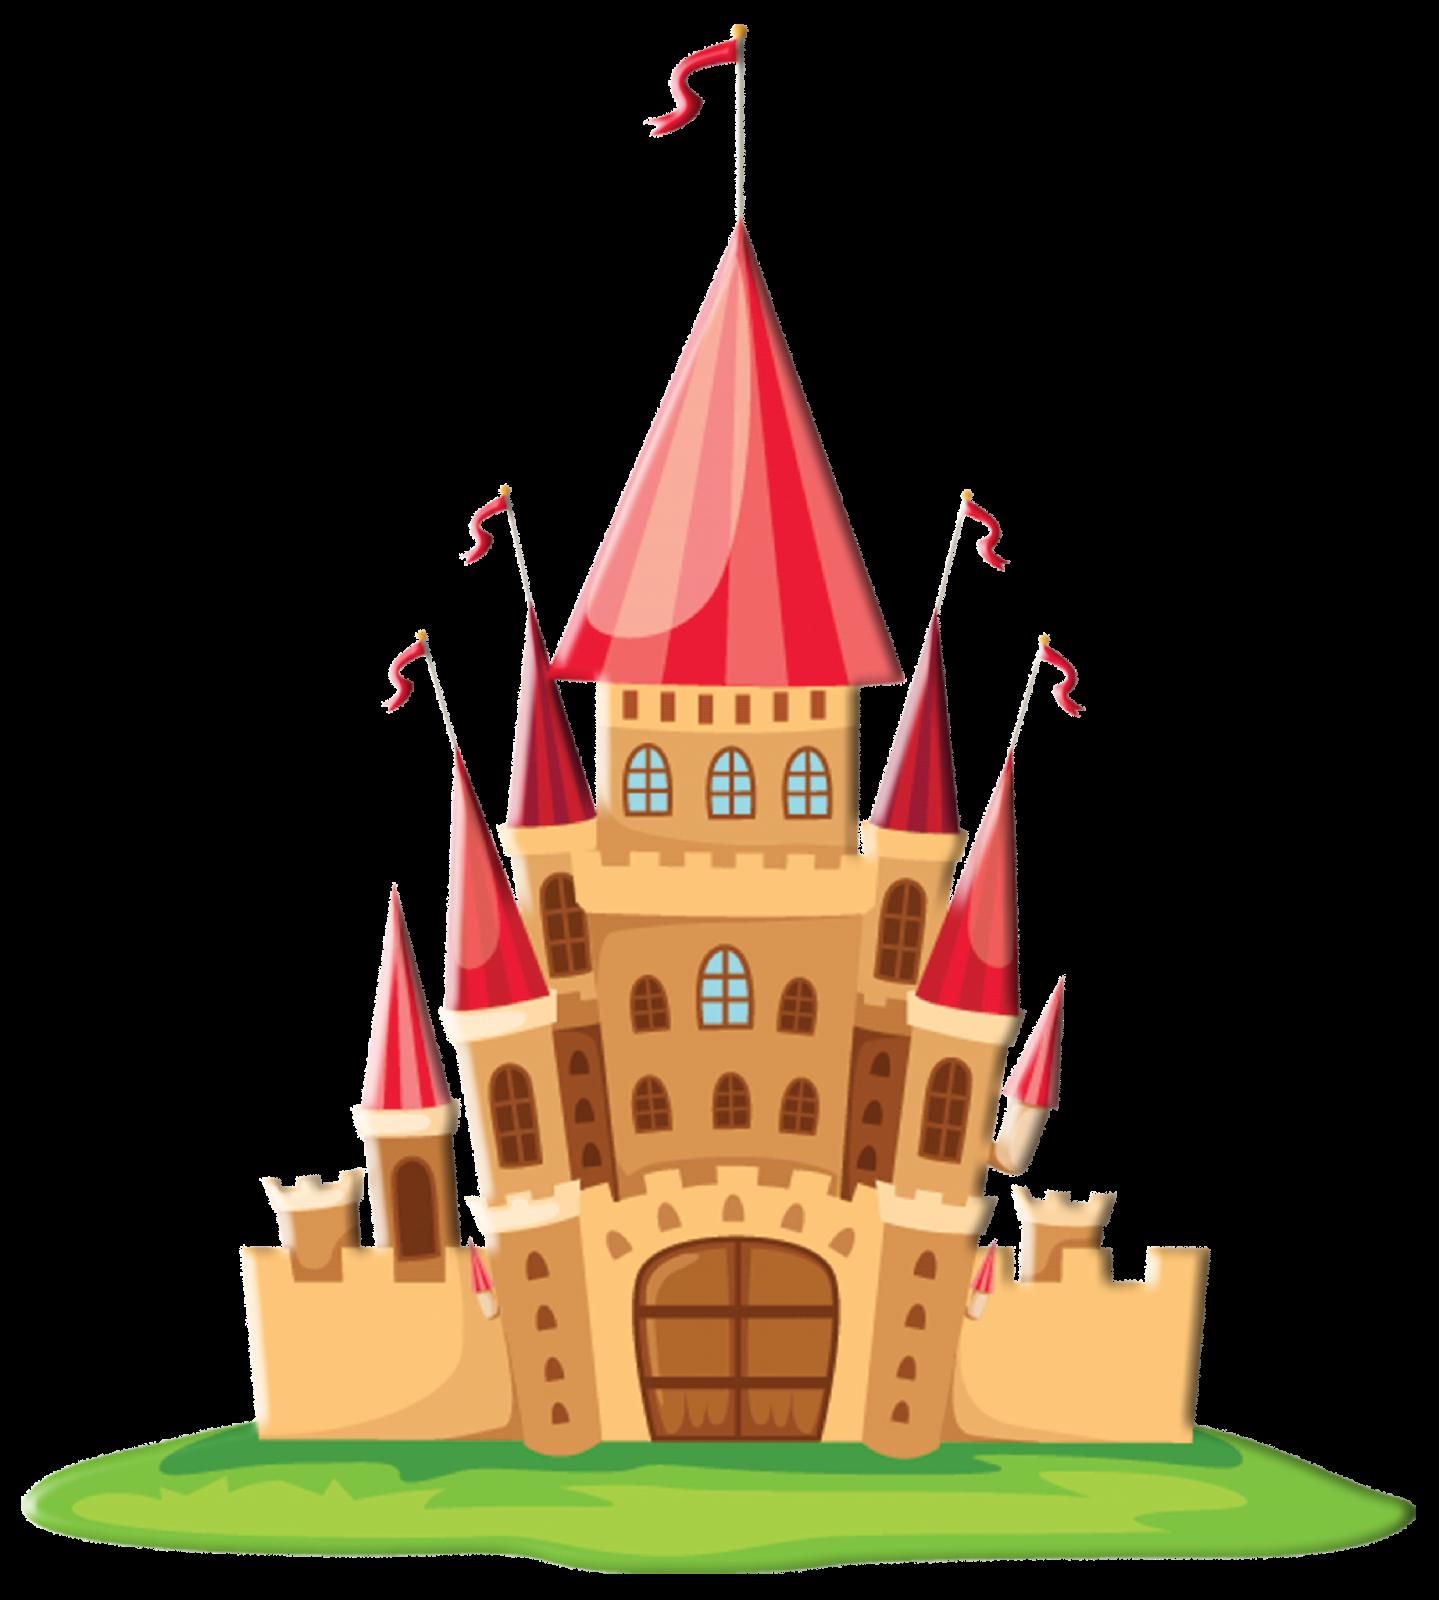 Clipart castle spanish. Princess and fairytale oh